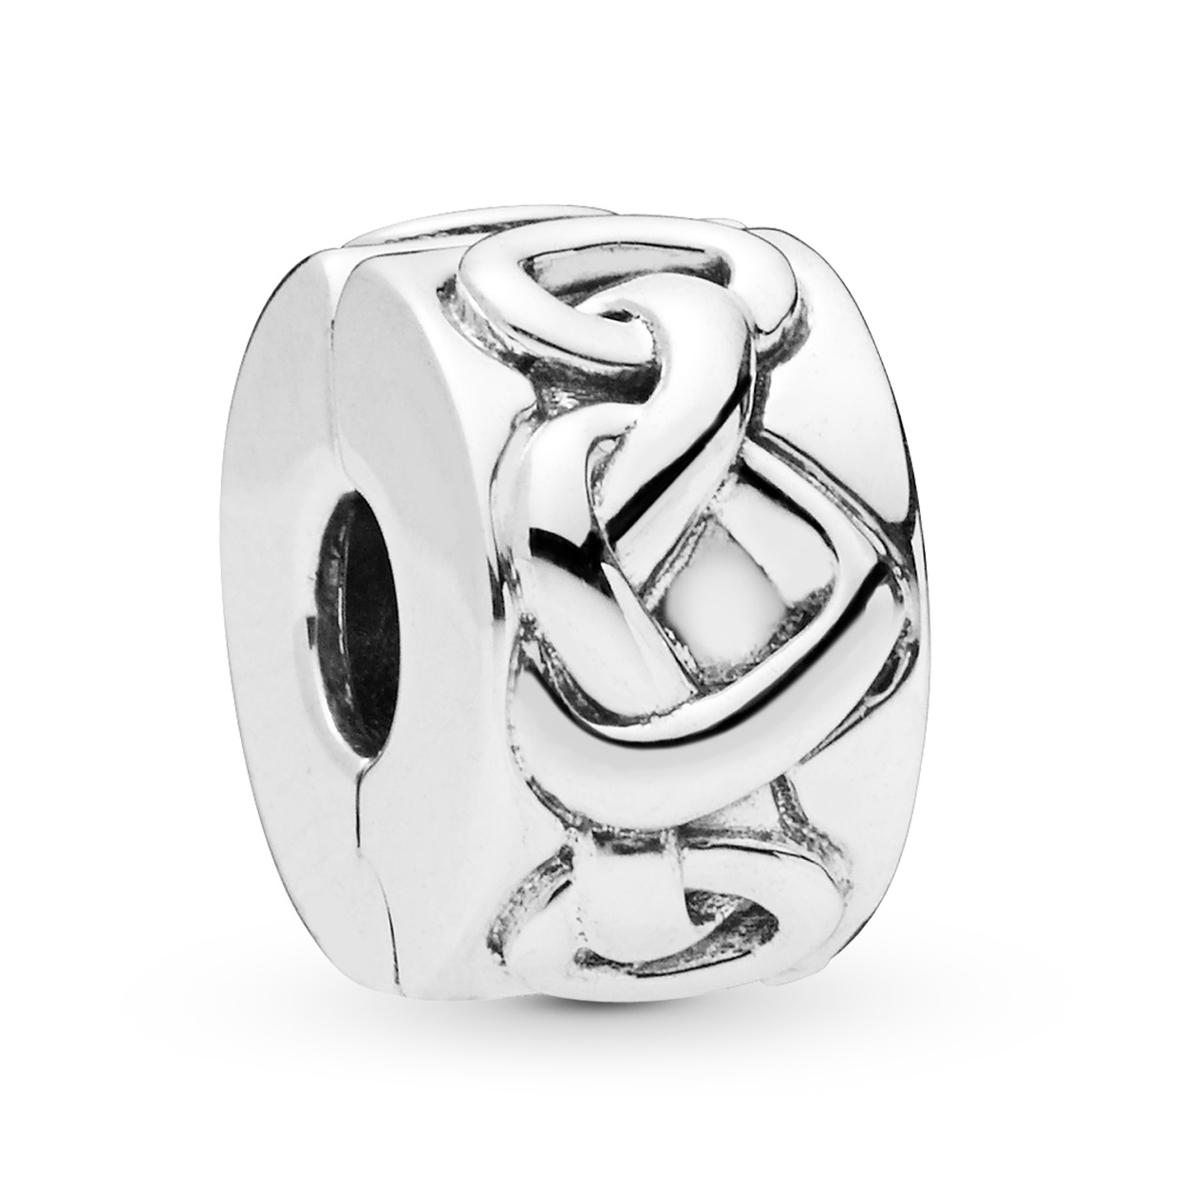 59343a393 PANDORA Clips & Safety Chains - Pancharmbracelets.com